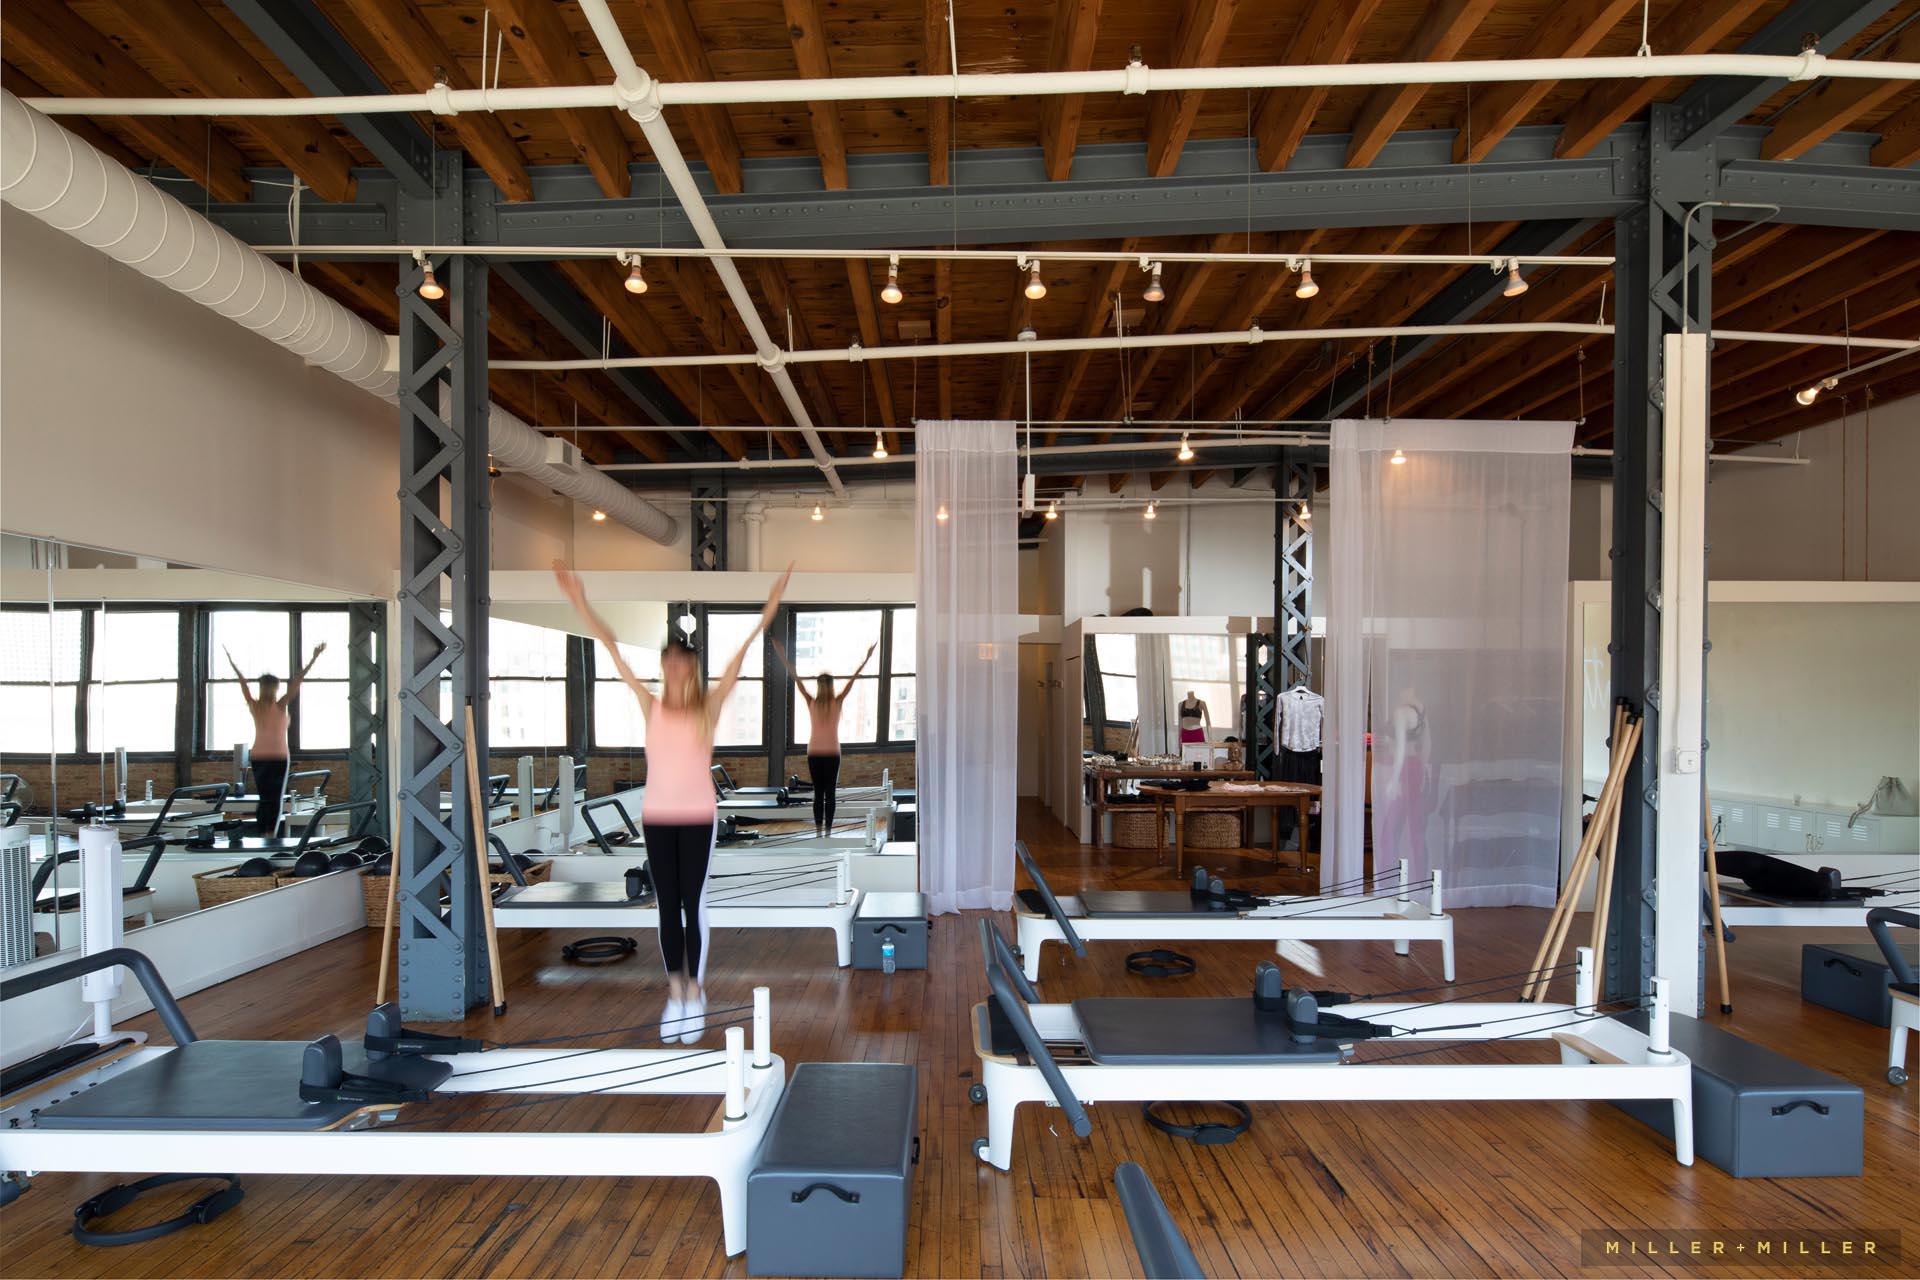 gym fitness class center interior photography